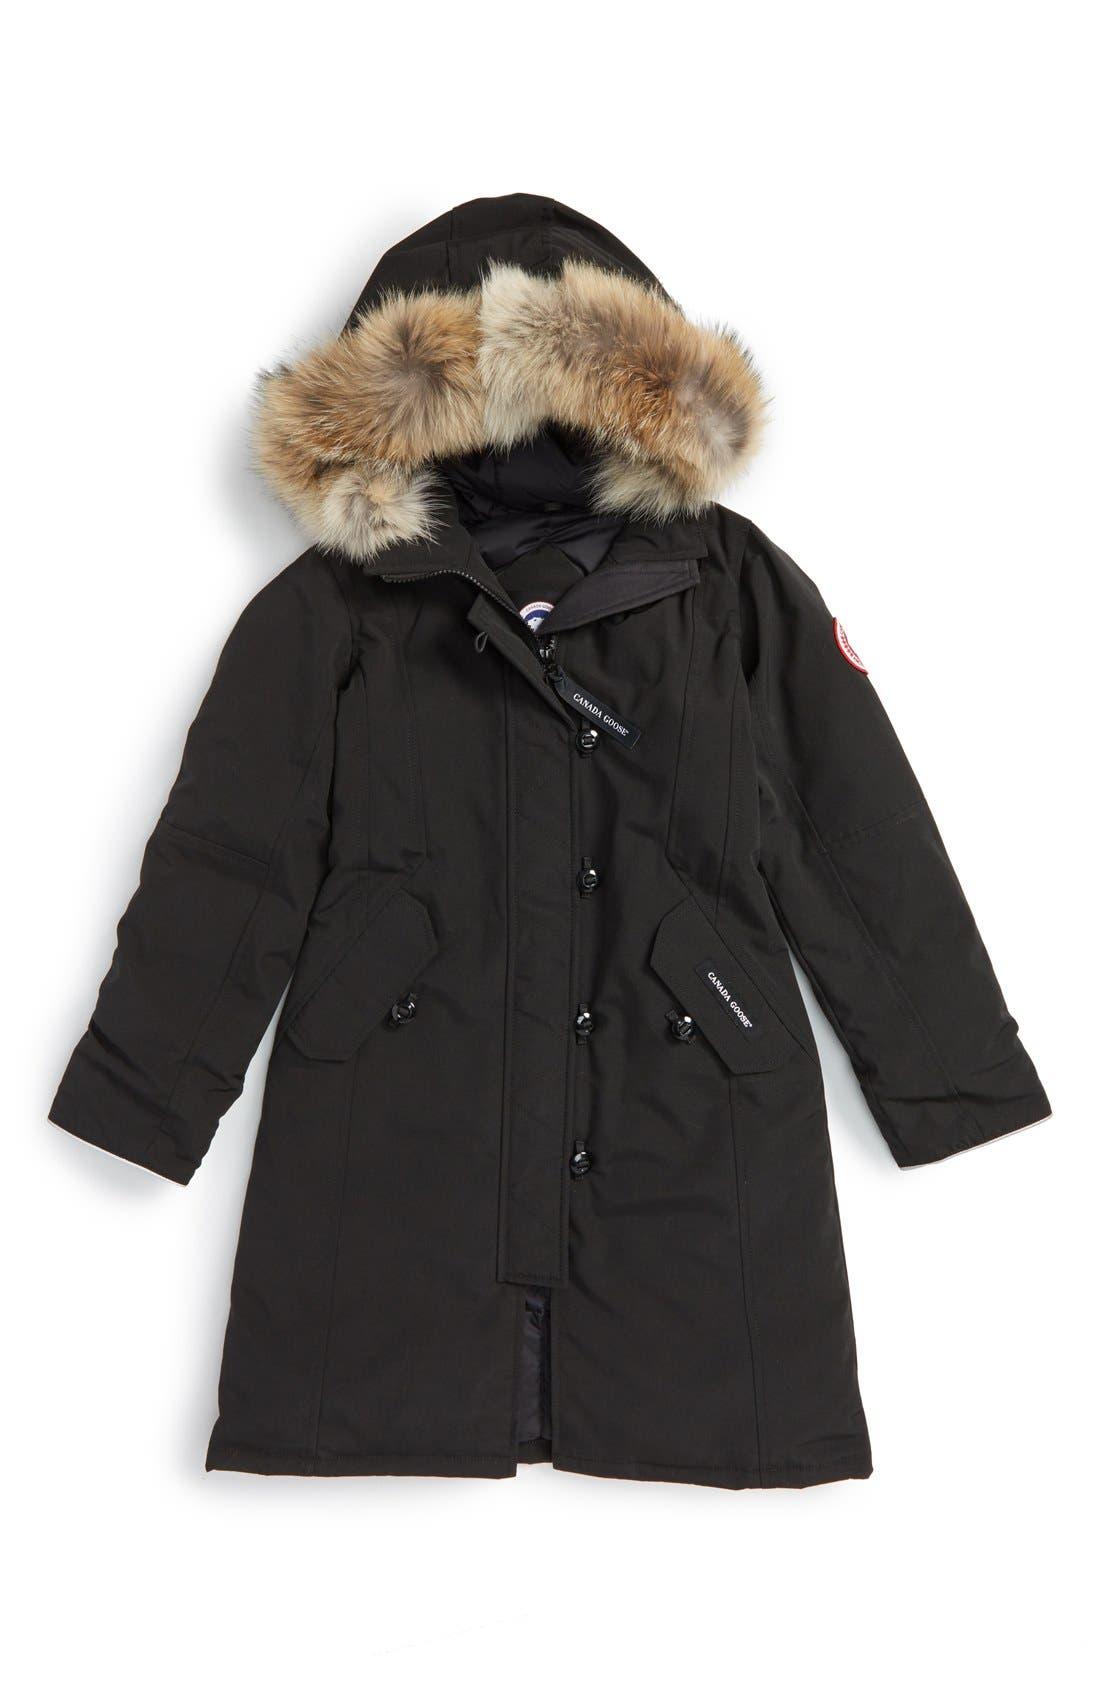 CANADA GOOSE, 'Brittania' Down Parka with Genuine Coyote Fur Trim, Main thumbnail 1, color, BLACK